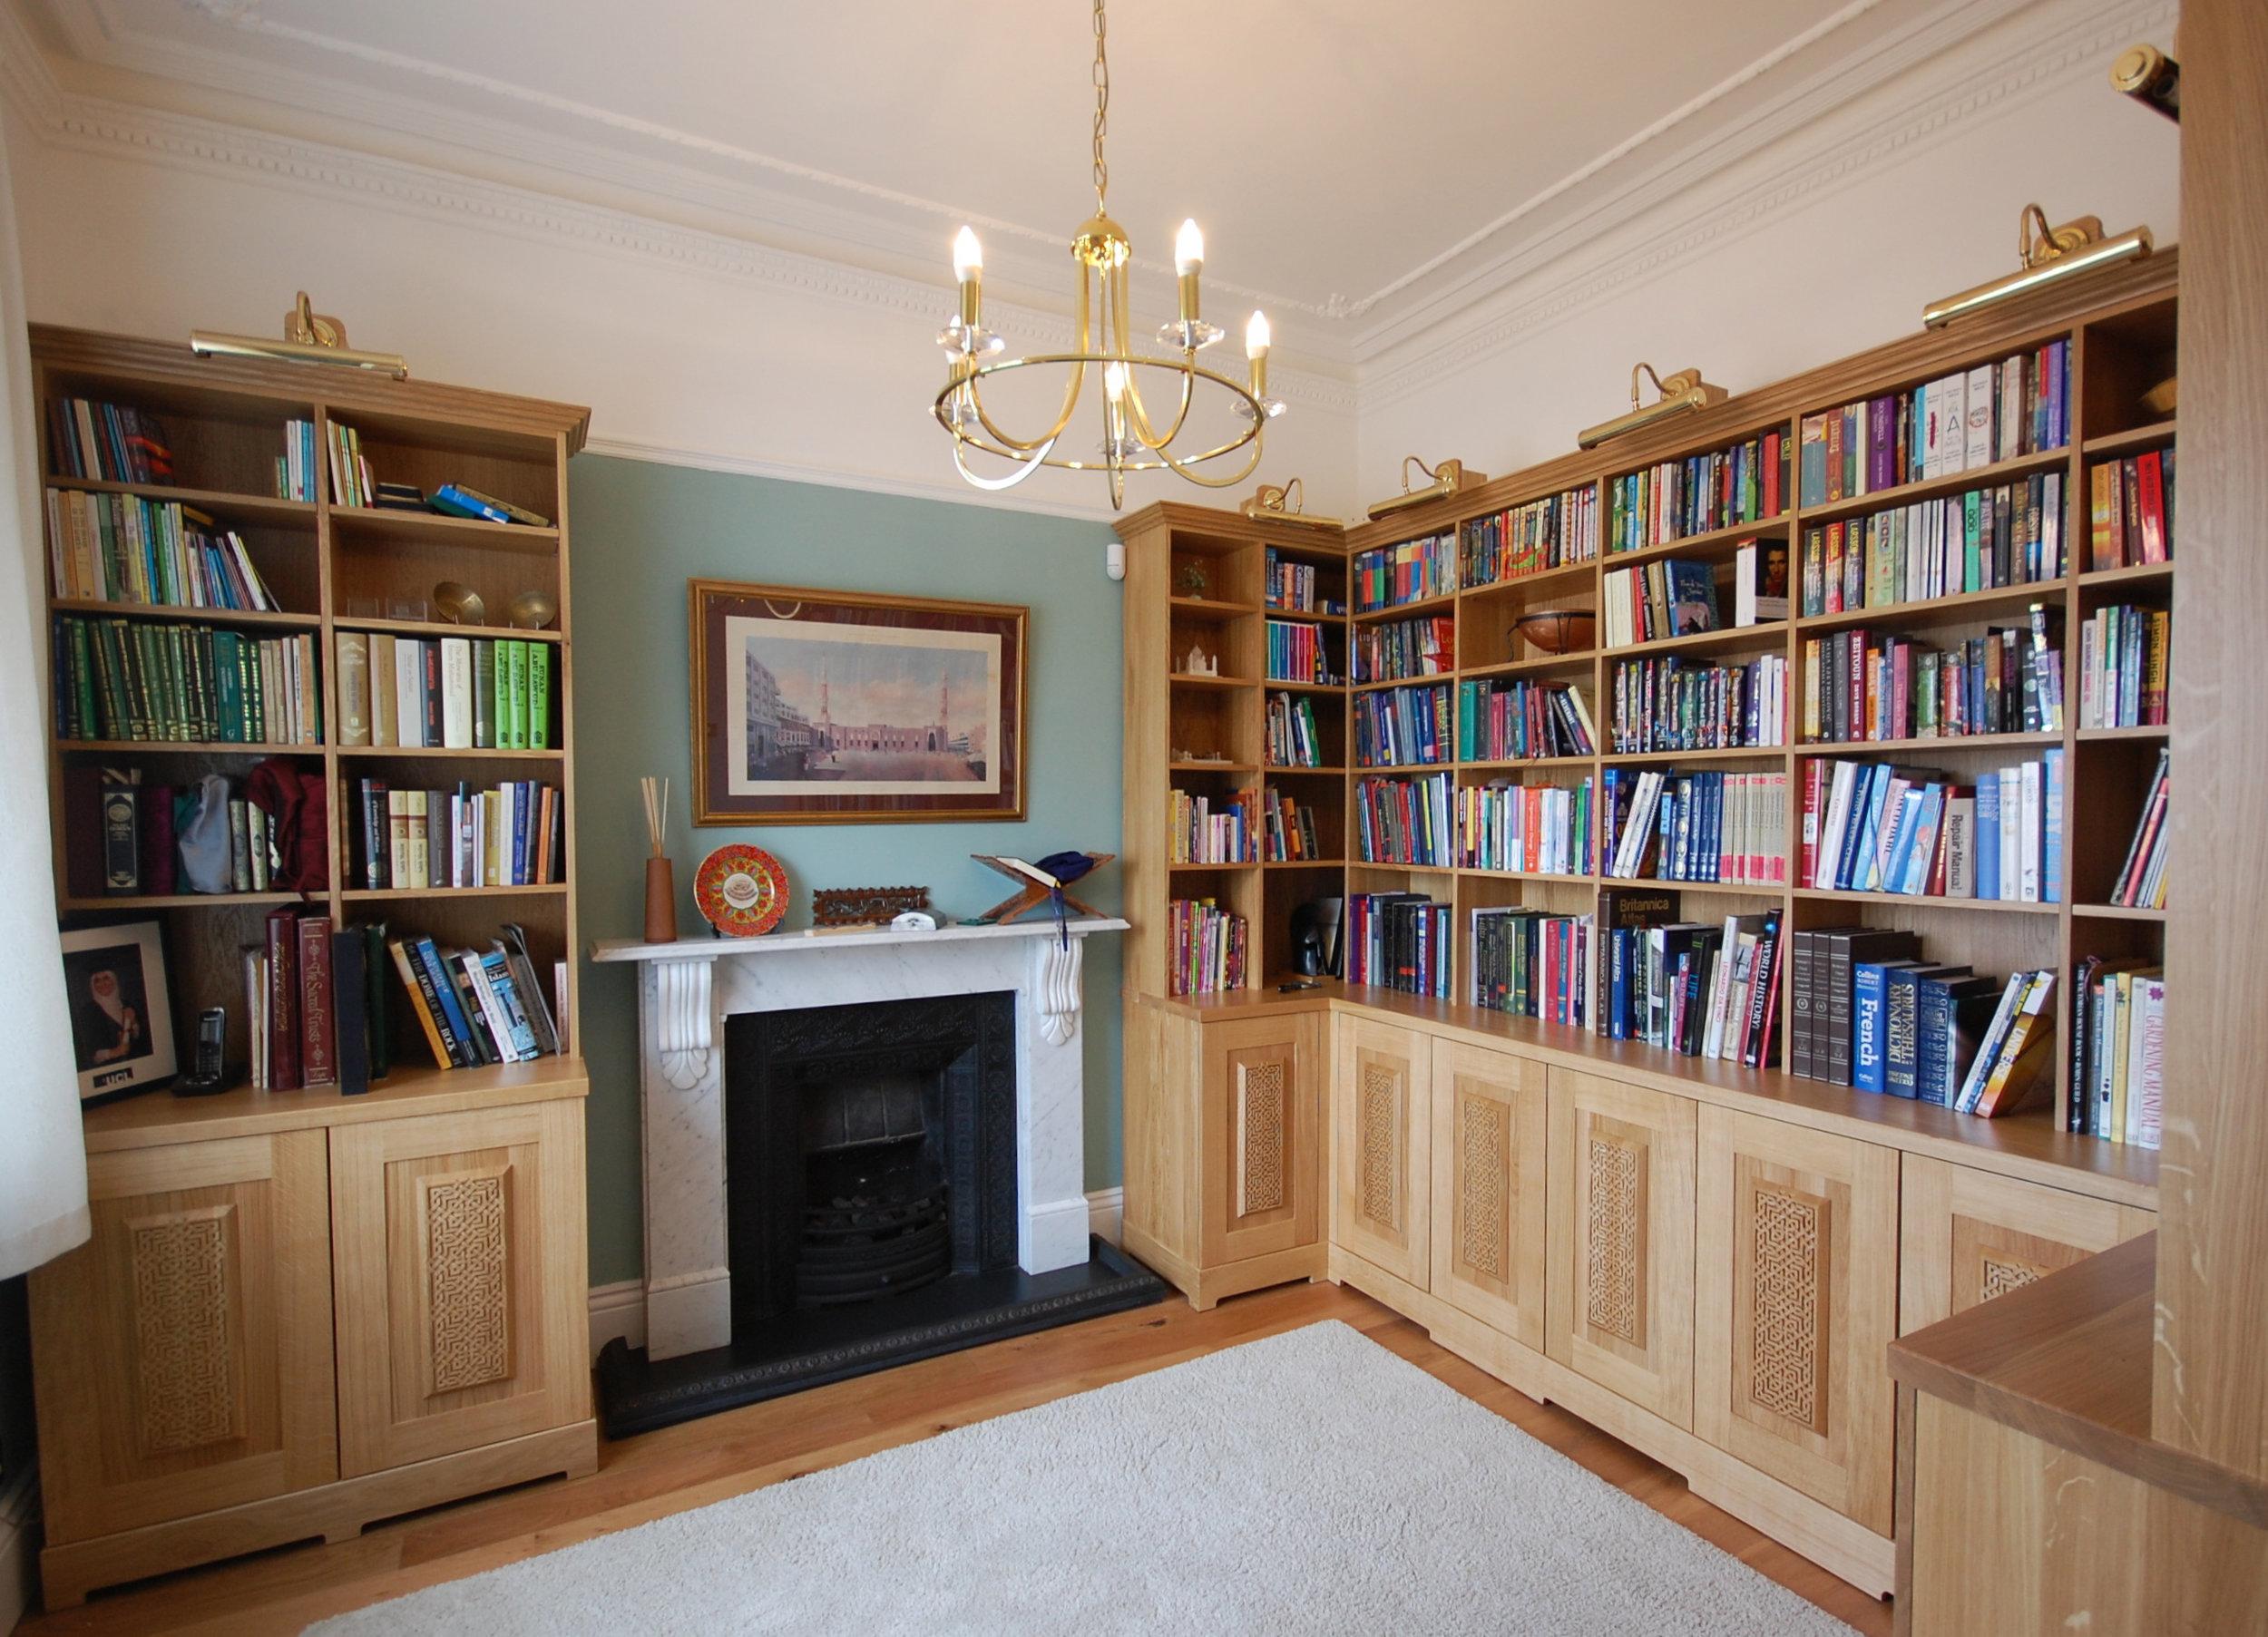 Grain_Bespoke_Furniture_Solid_Oak_Library_3.jpg